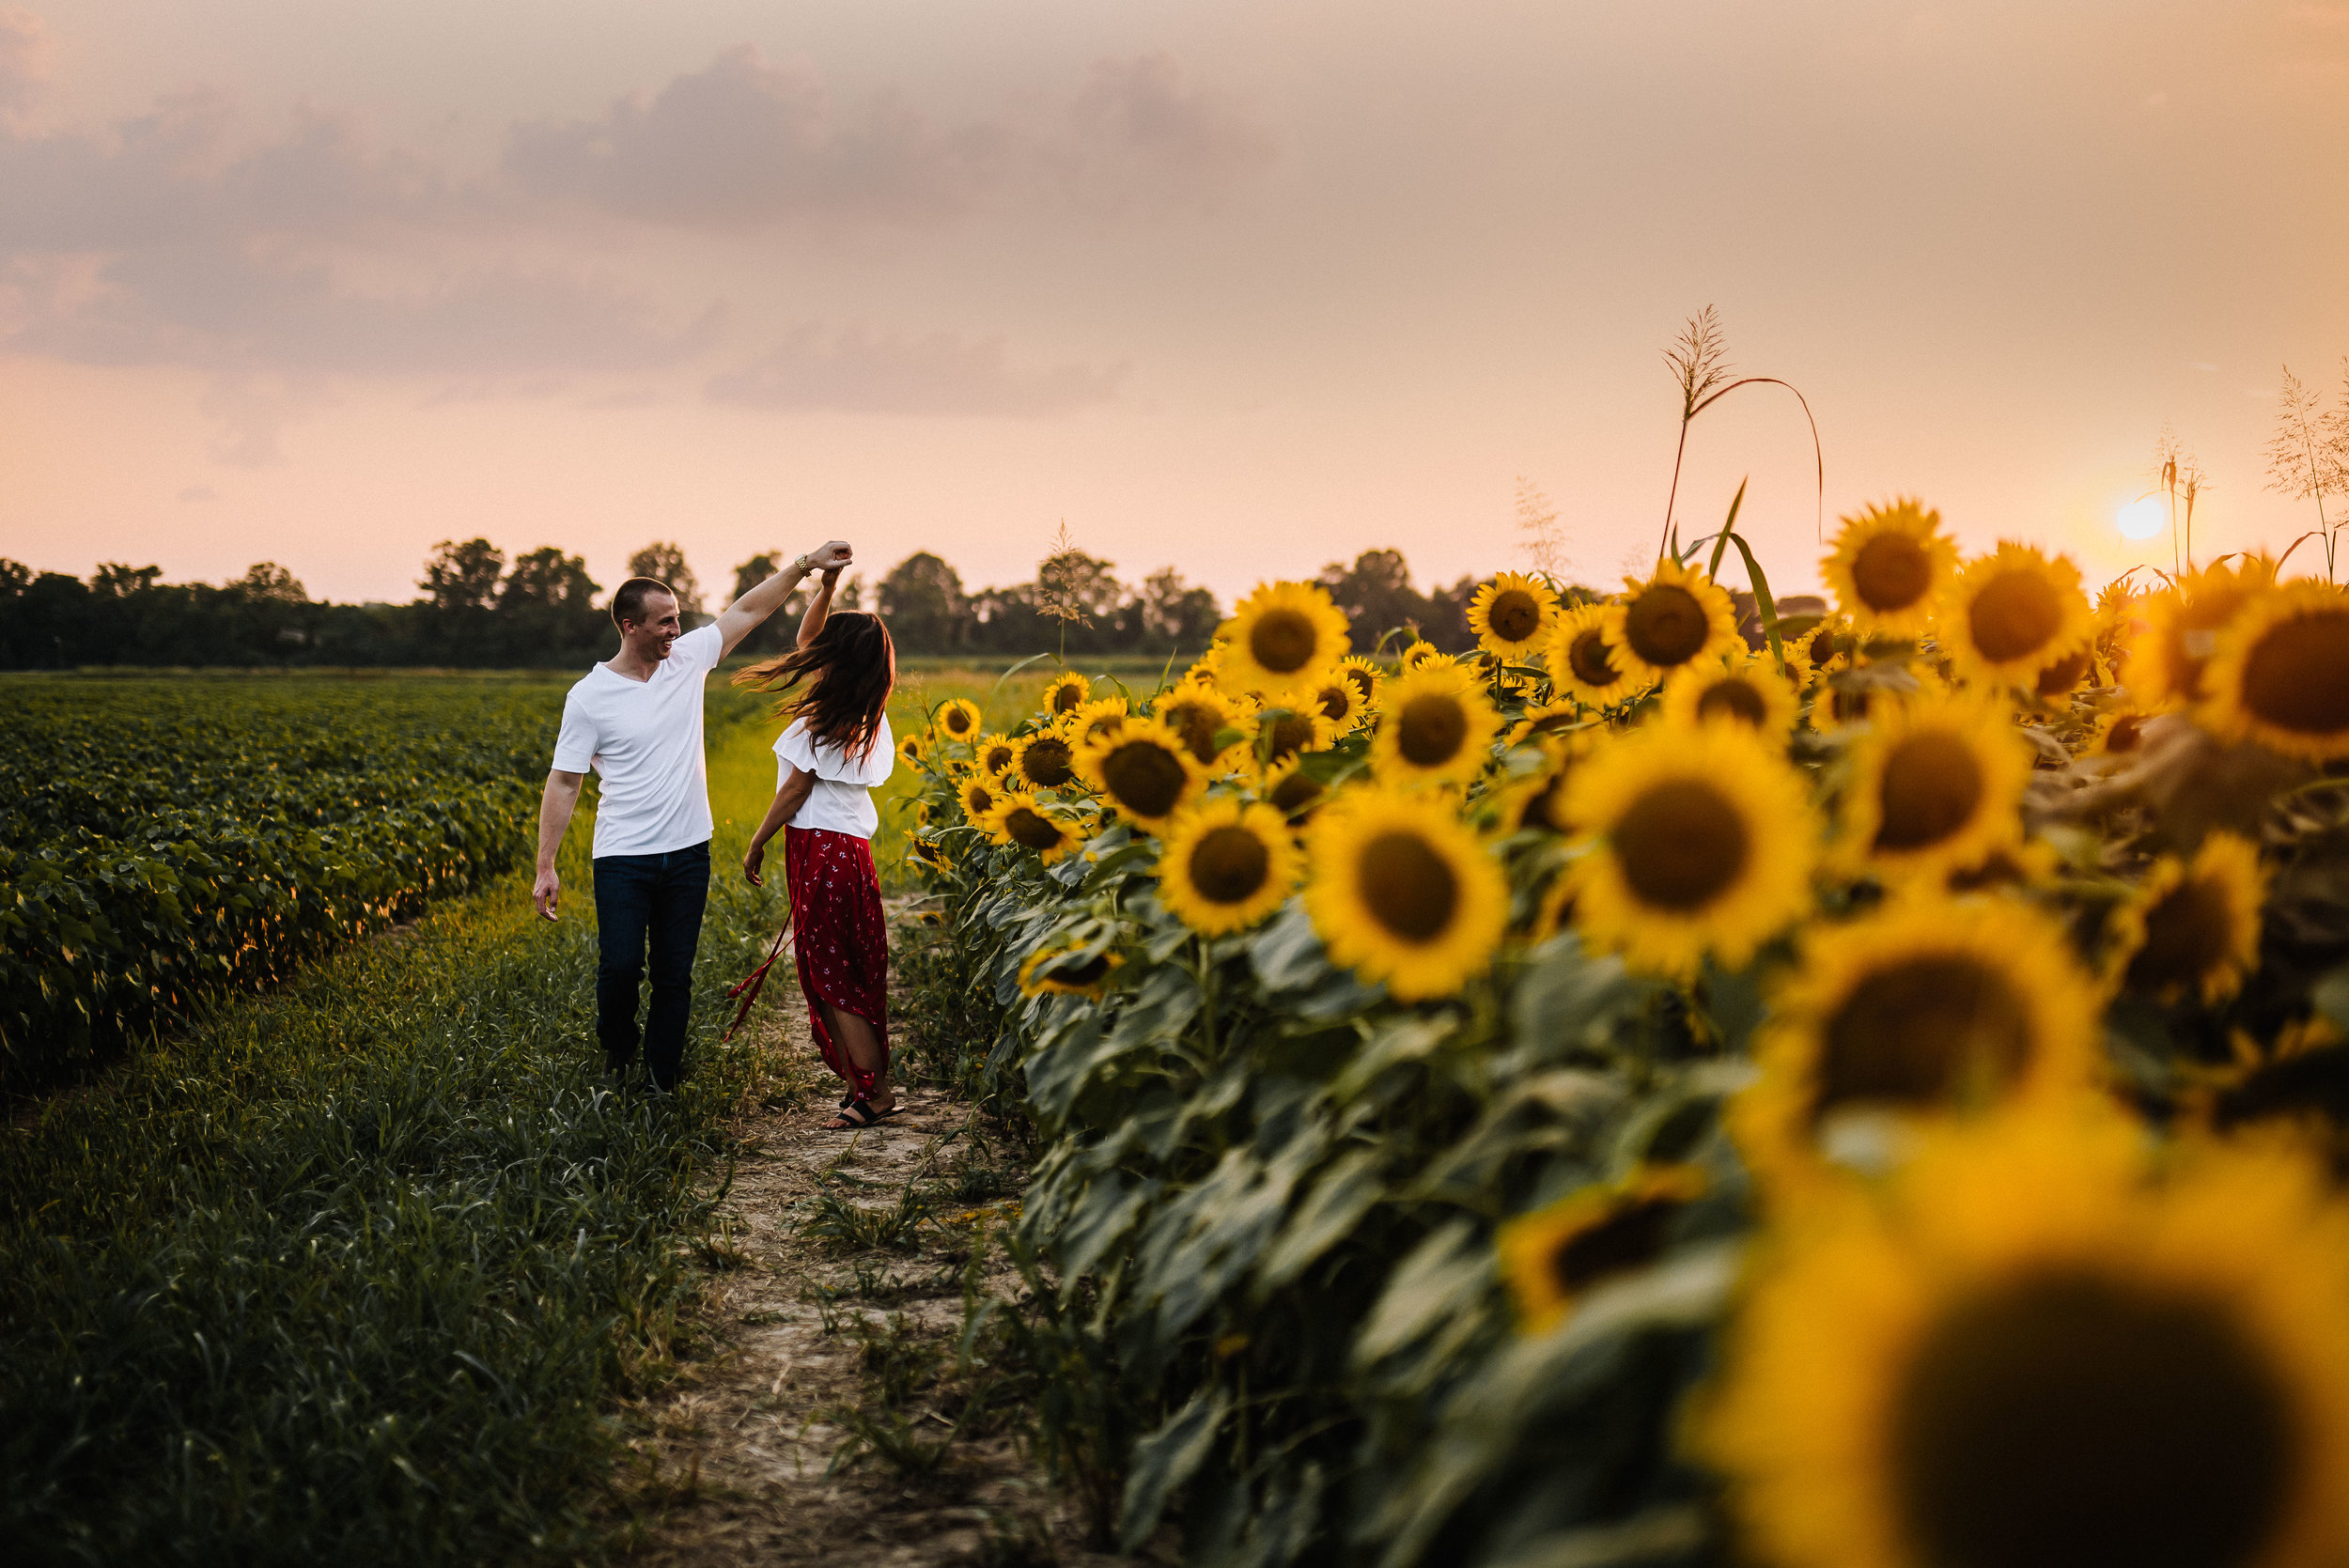 Kaitlynne&Van_Sunflowers_Ashley-Benham-Photography-46.jpg